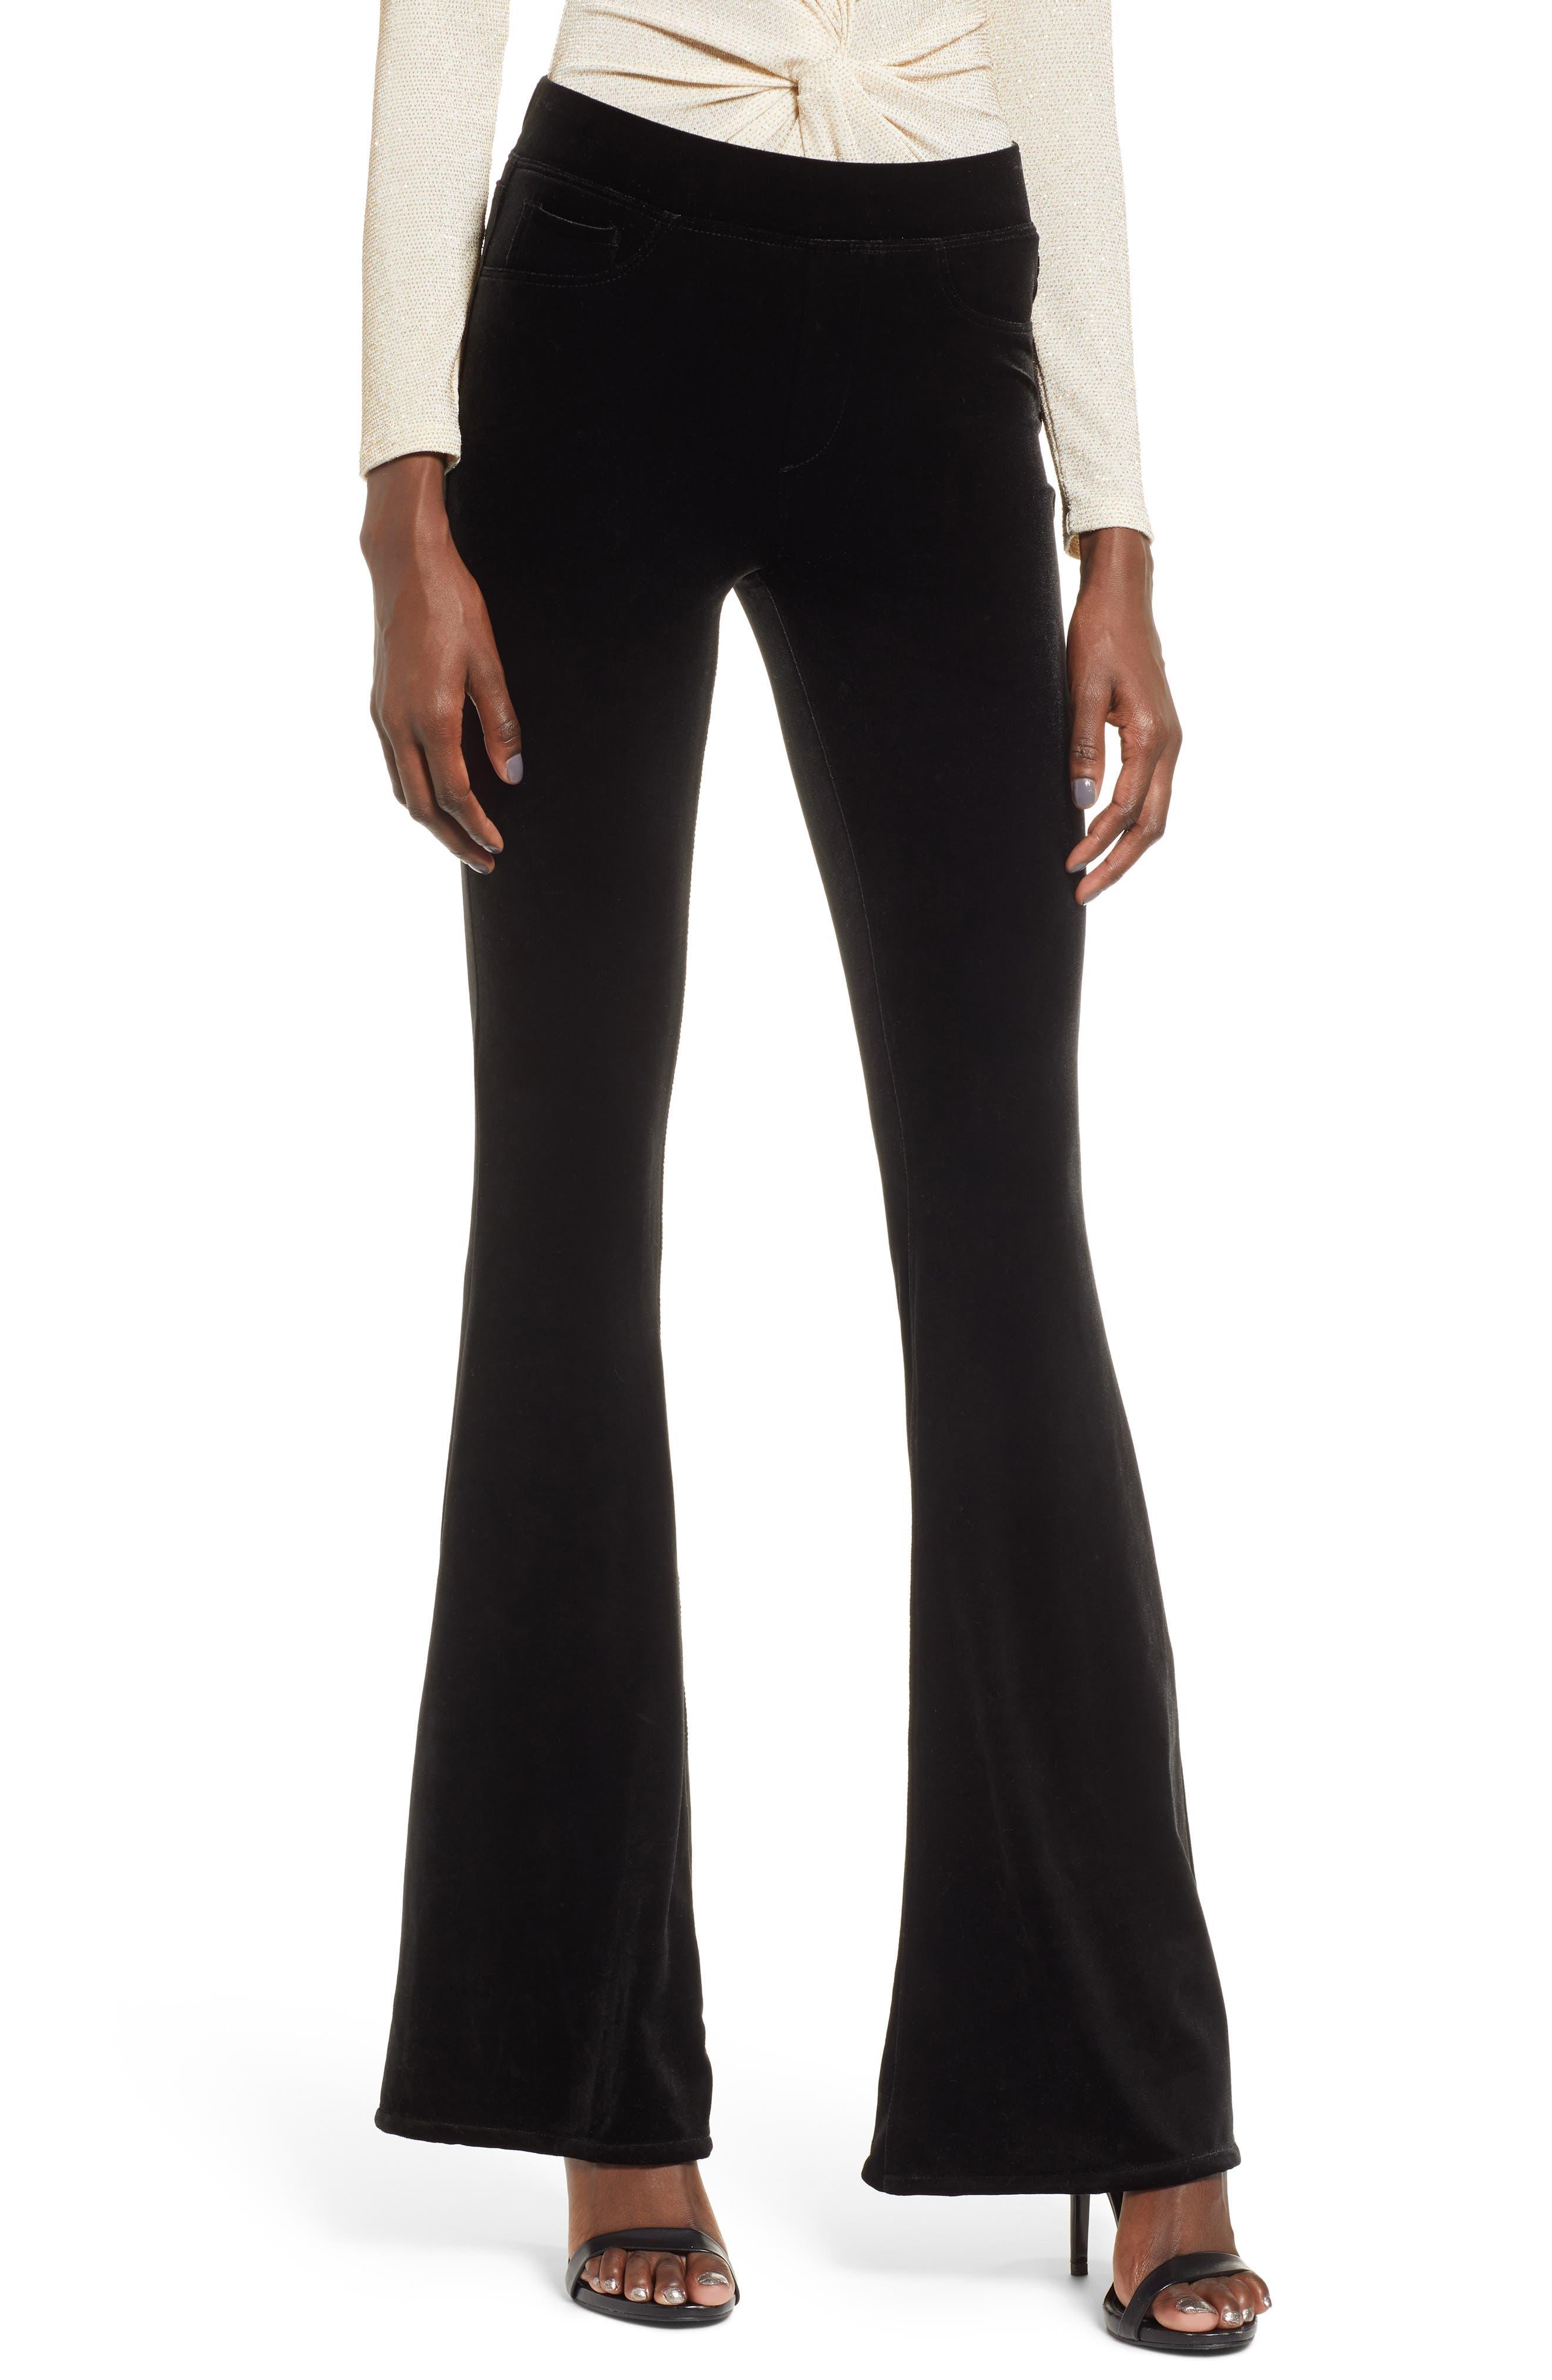 Blanknyc Velvet Flare Pants, Black